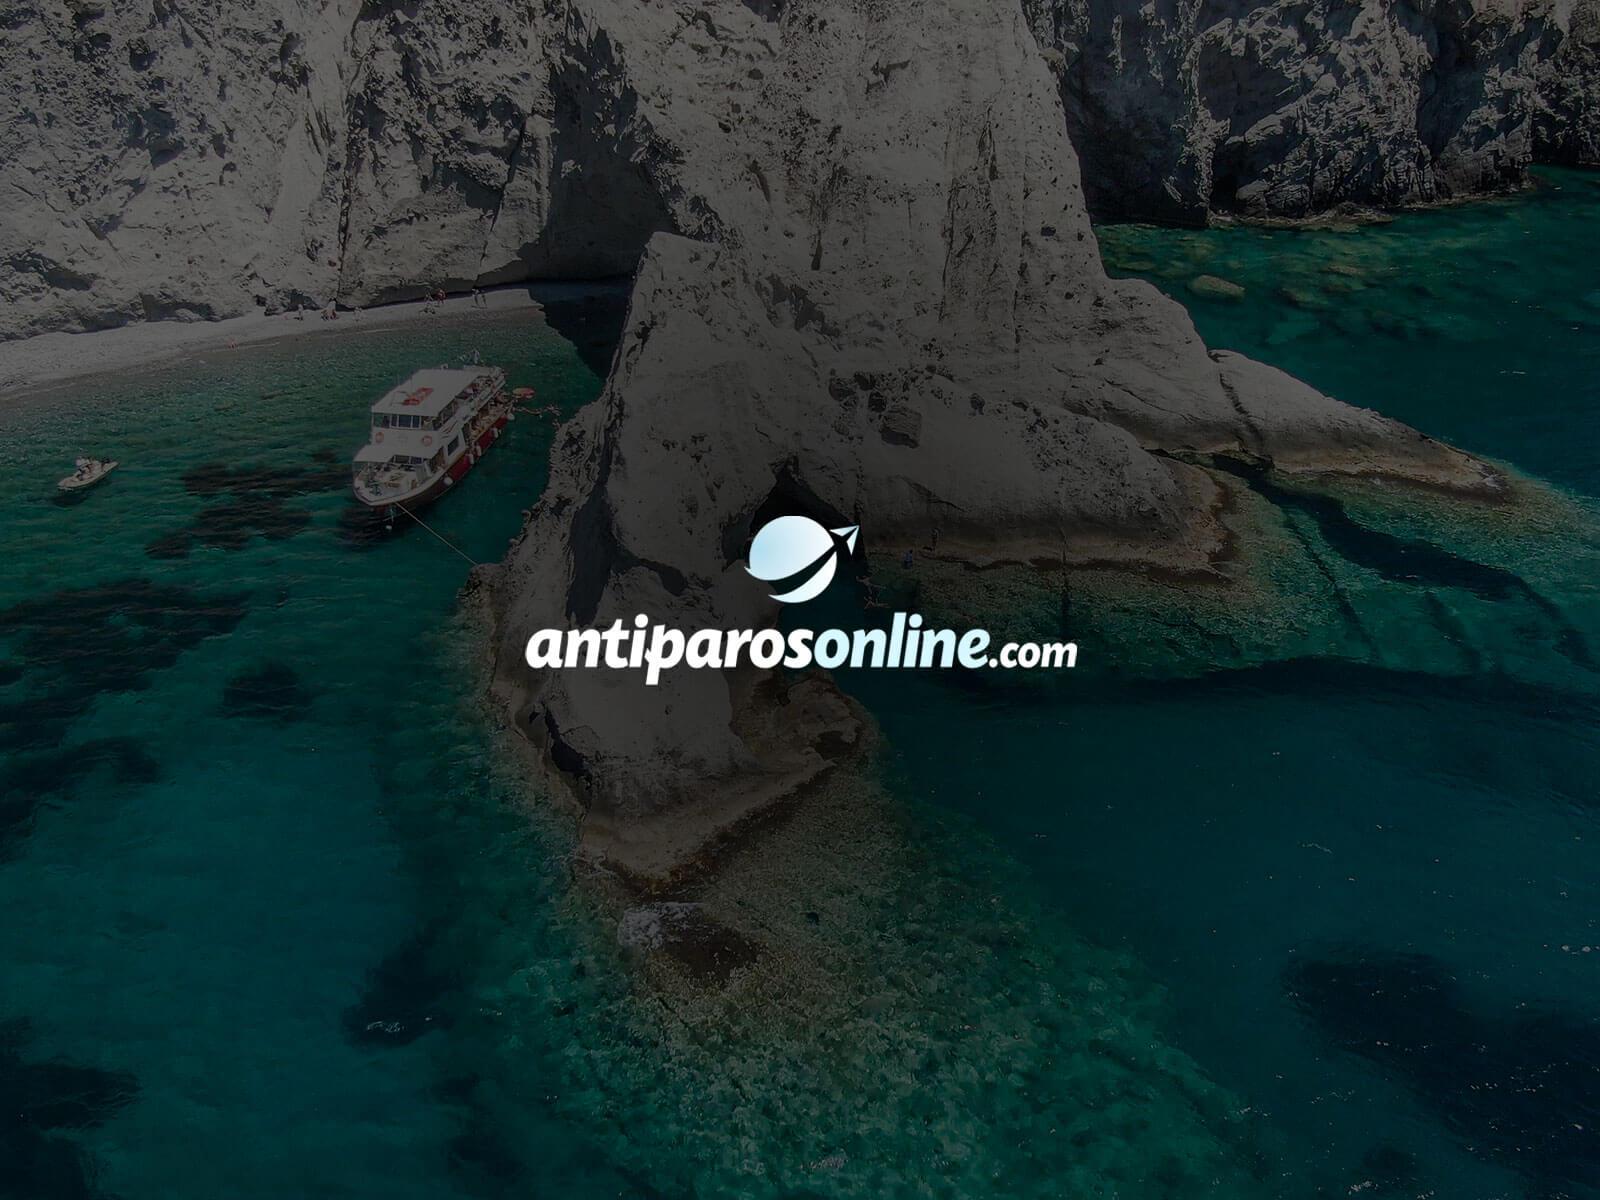 antiparosonline.com | The Antiparos travel guide